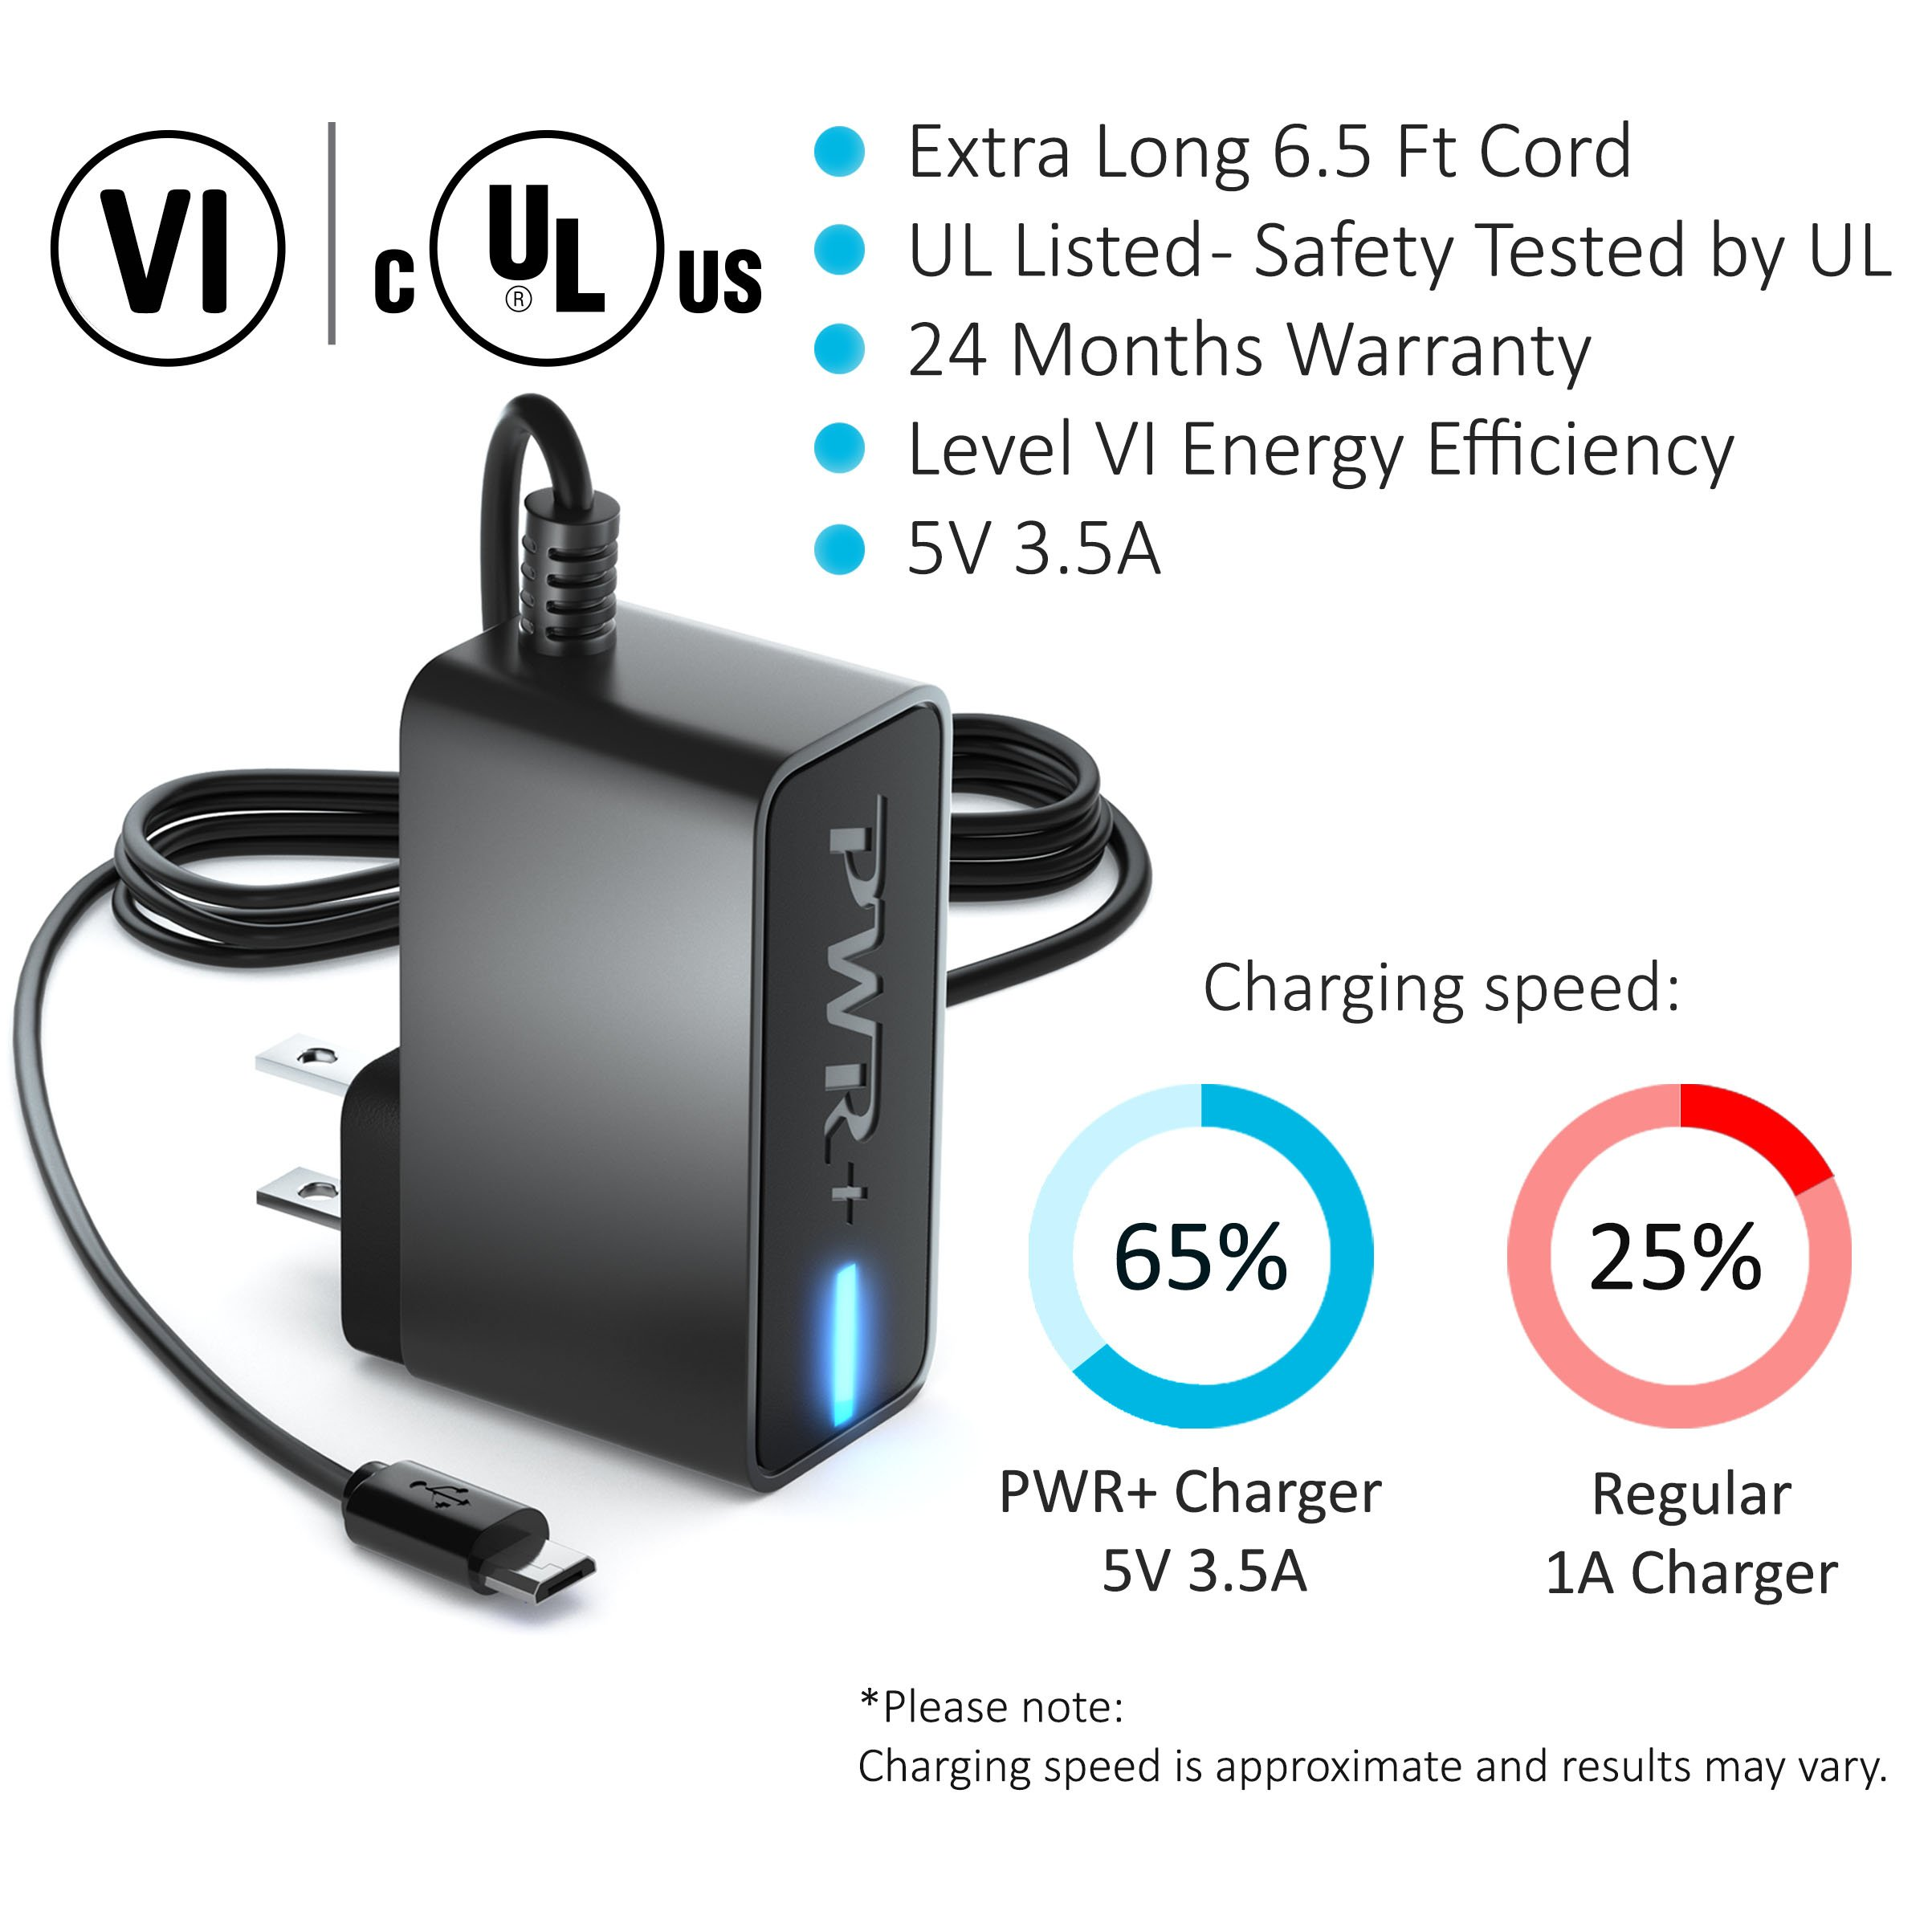 UL Listed 6.5 Ft Fastest 3.5A Charger Samsung-Galaxy Tab 3 4 A E S S2 7.0 8.0 8.4 9.6 9.7 10.5 10.1 12.2 Pro Kids Note 2014 Google-Nexus 7 9 10 EP-TA10JWE ETA-U90JWE U90JWEBXAR U90JBEGXAR ETA0U80JBE by PWR+ (Image #6)